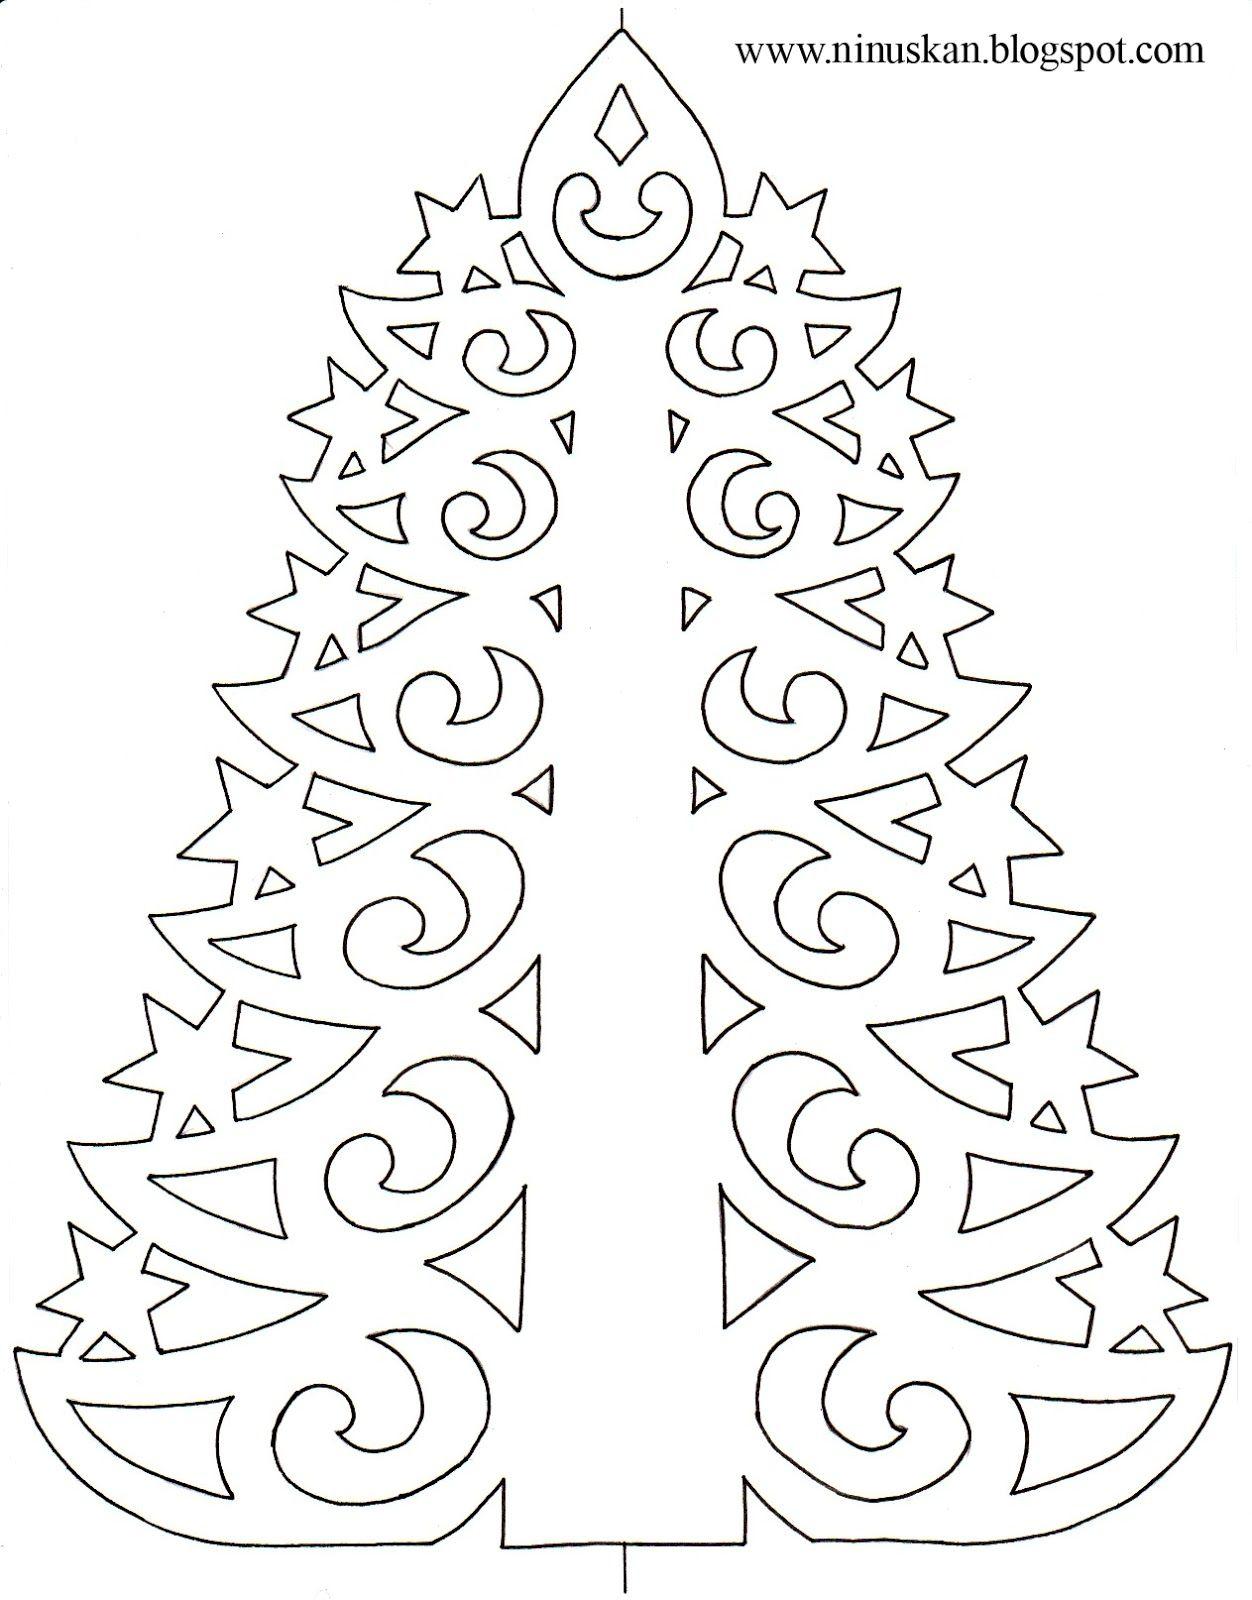 Ninuska: Pitsinen Paperikuusi / Paper Lace Tree Template | Crafty regarding Printable Christmas Tree Templates 3D